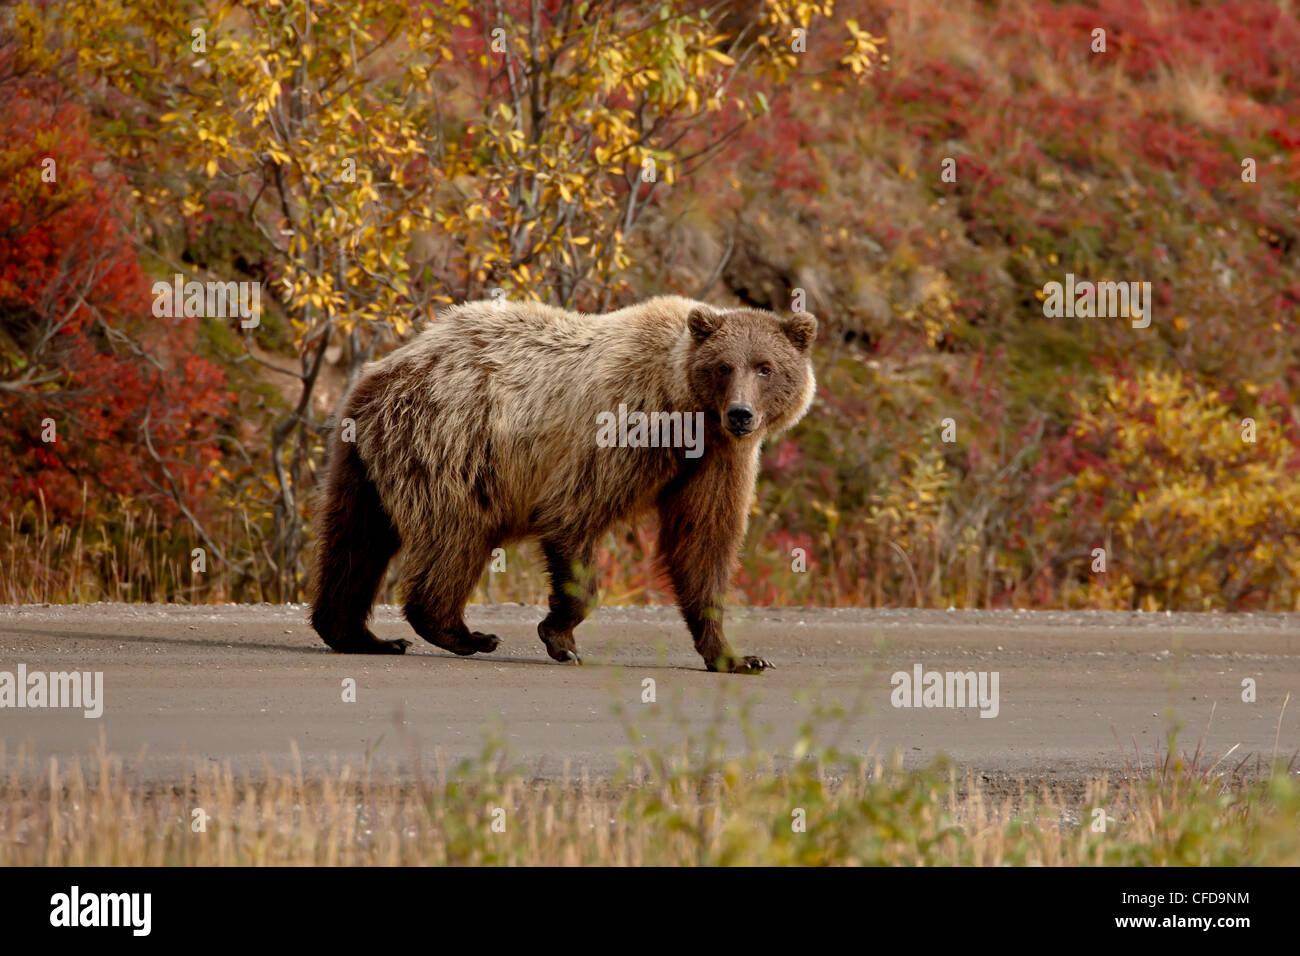 Grizzly bear (Ursus arctos horribilis) (Coastal brown bear) on a road, Denali National Park and Preserve, Alaska, - Stock Image